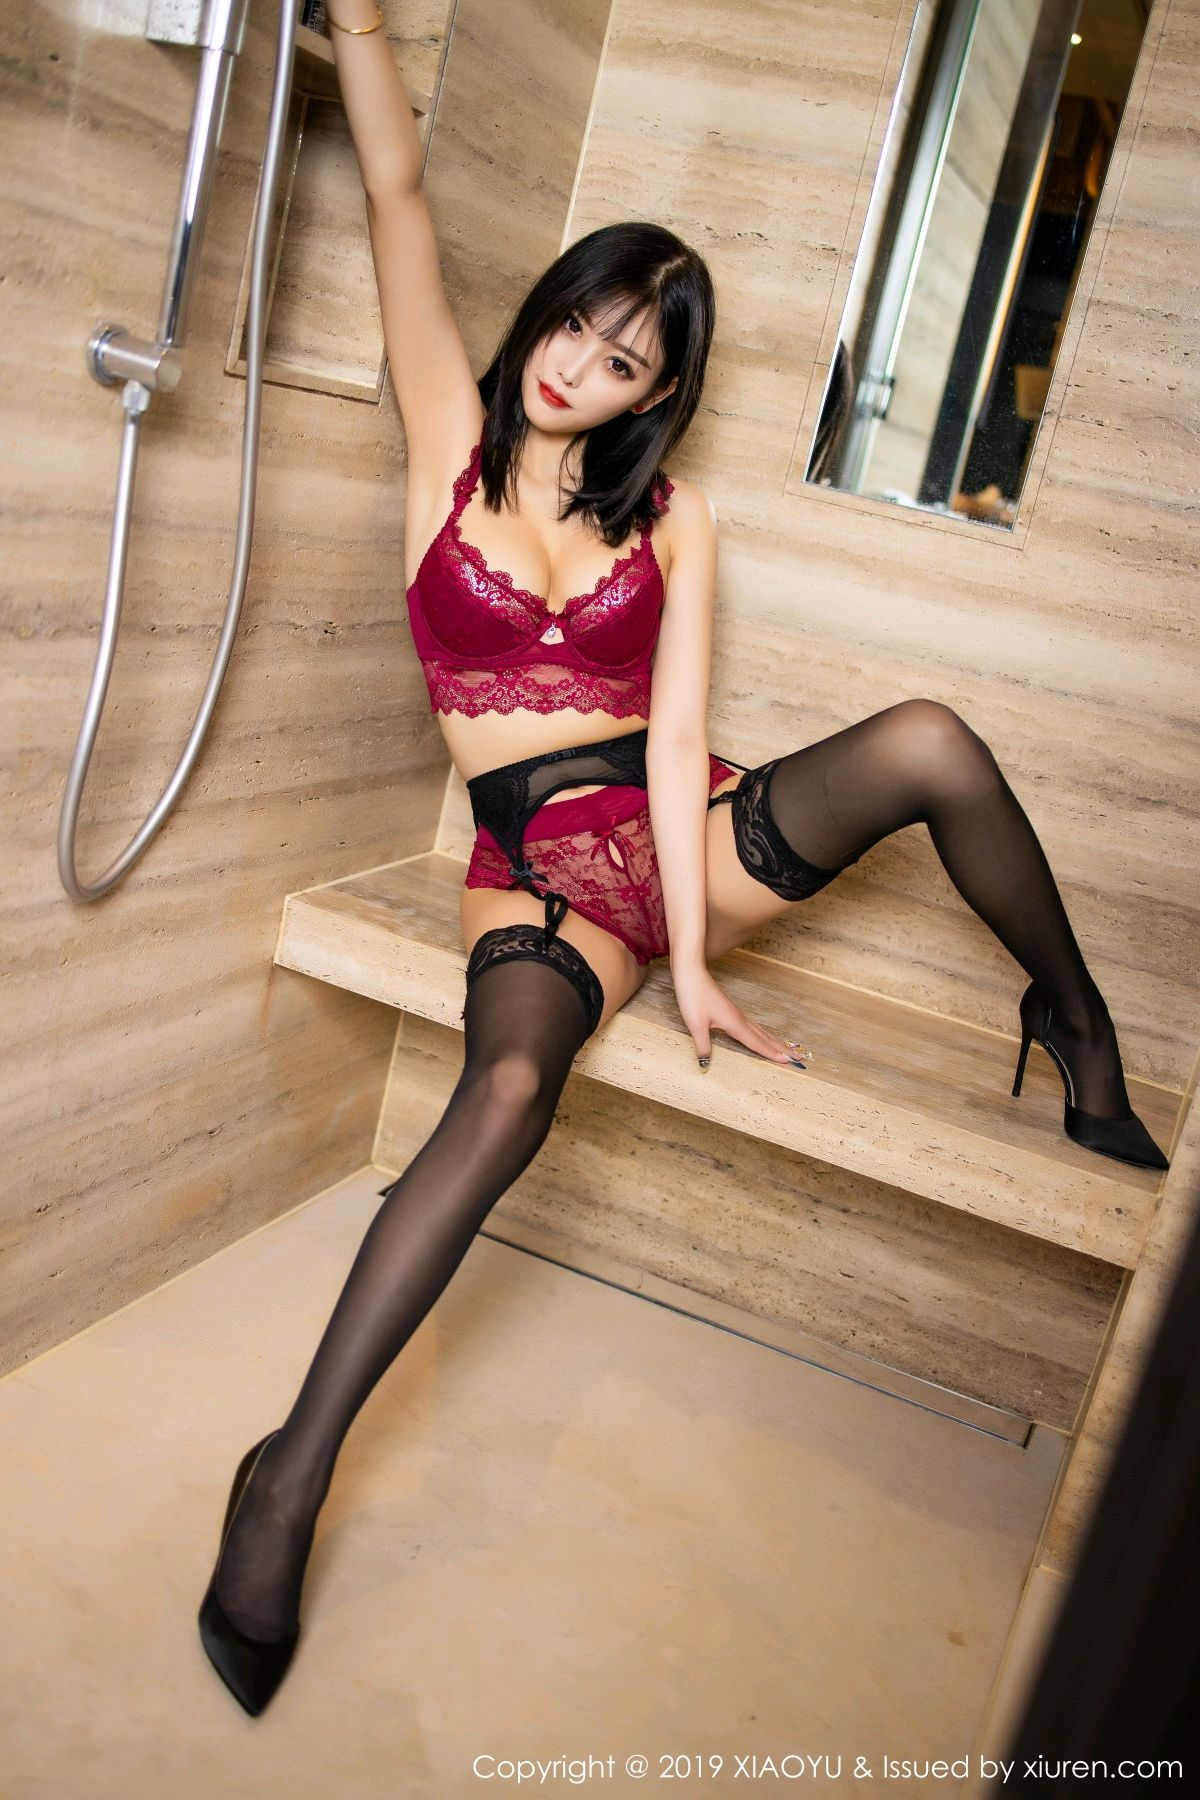 [XiaoYu] Vol.153 Yang Chen Chen 61P, Bathroom, Black Silk, Underwear, XiaoYu, Yang Chen Chen